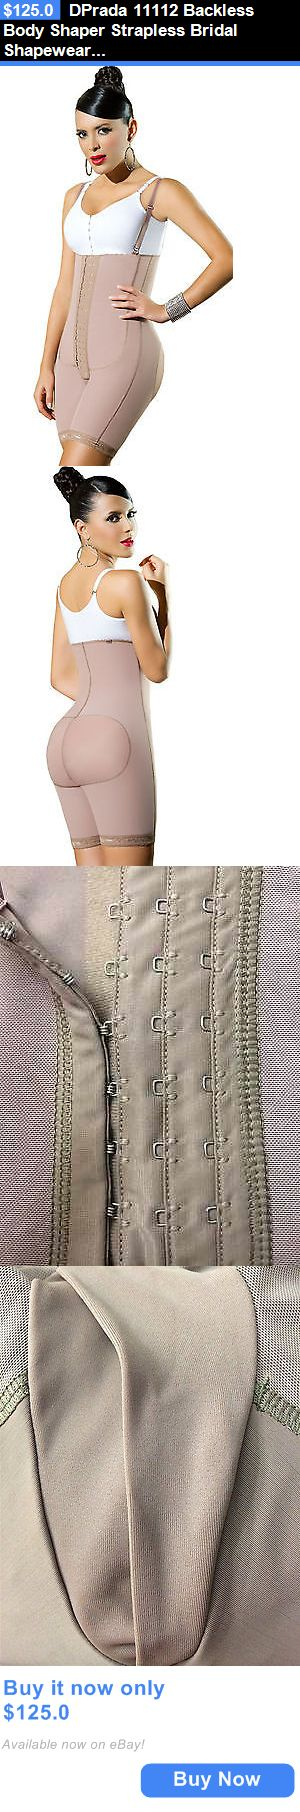 Women Shapewear: Dprada 11112 Backless Body Shaper Strapless Bridal Shapewear Postpartum Girdle BUY IT NOW ONLY: $125.0